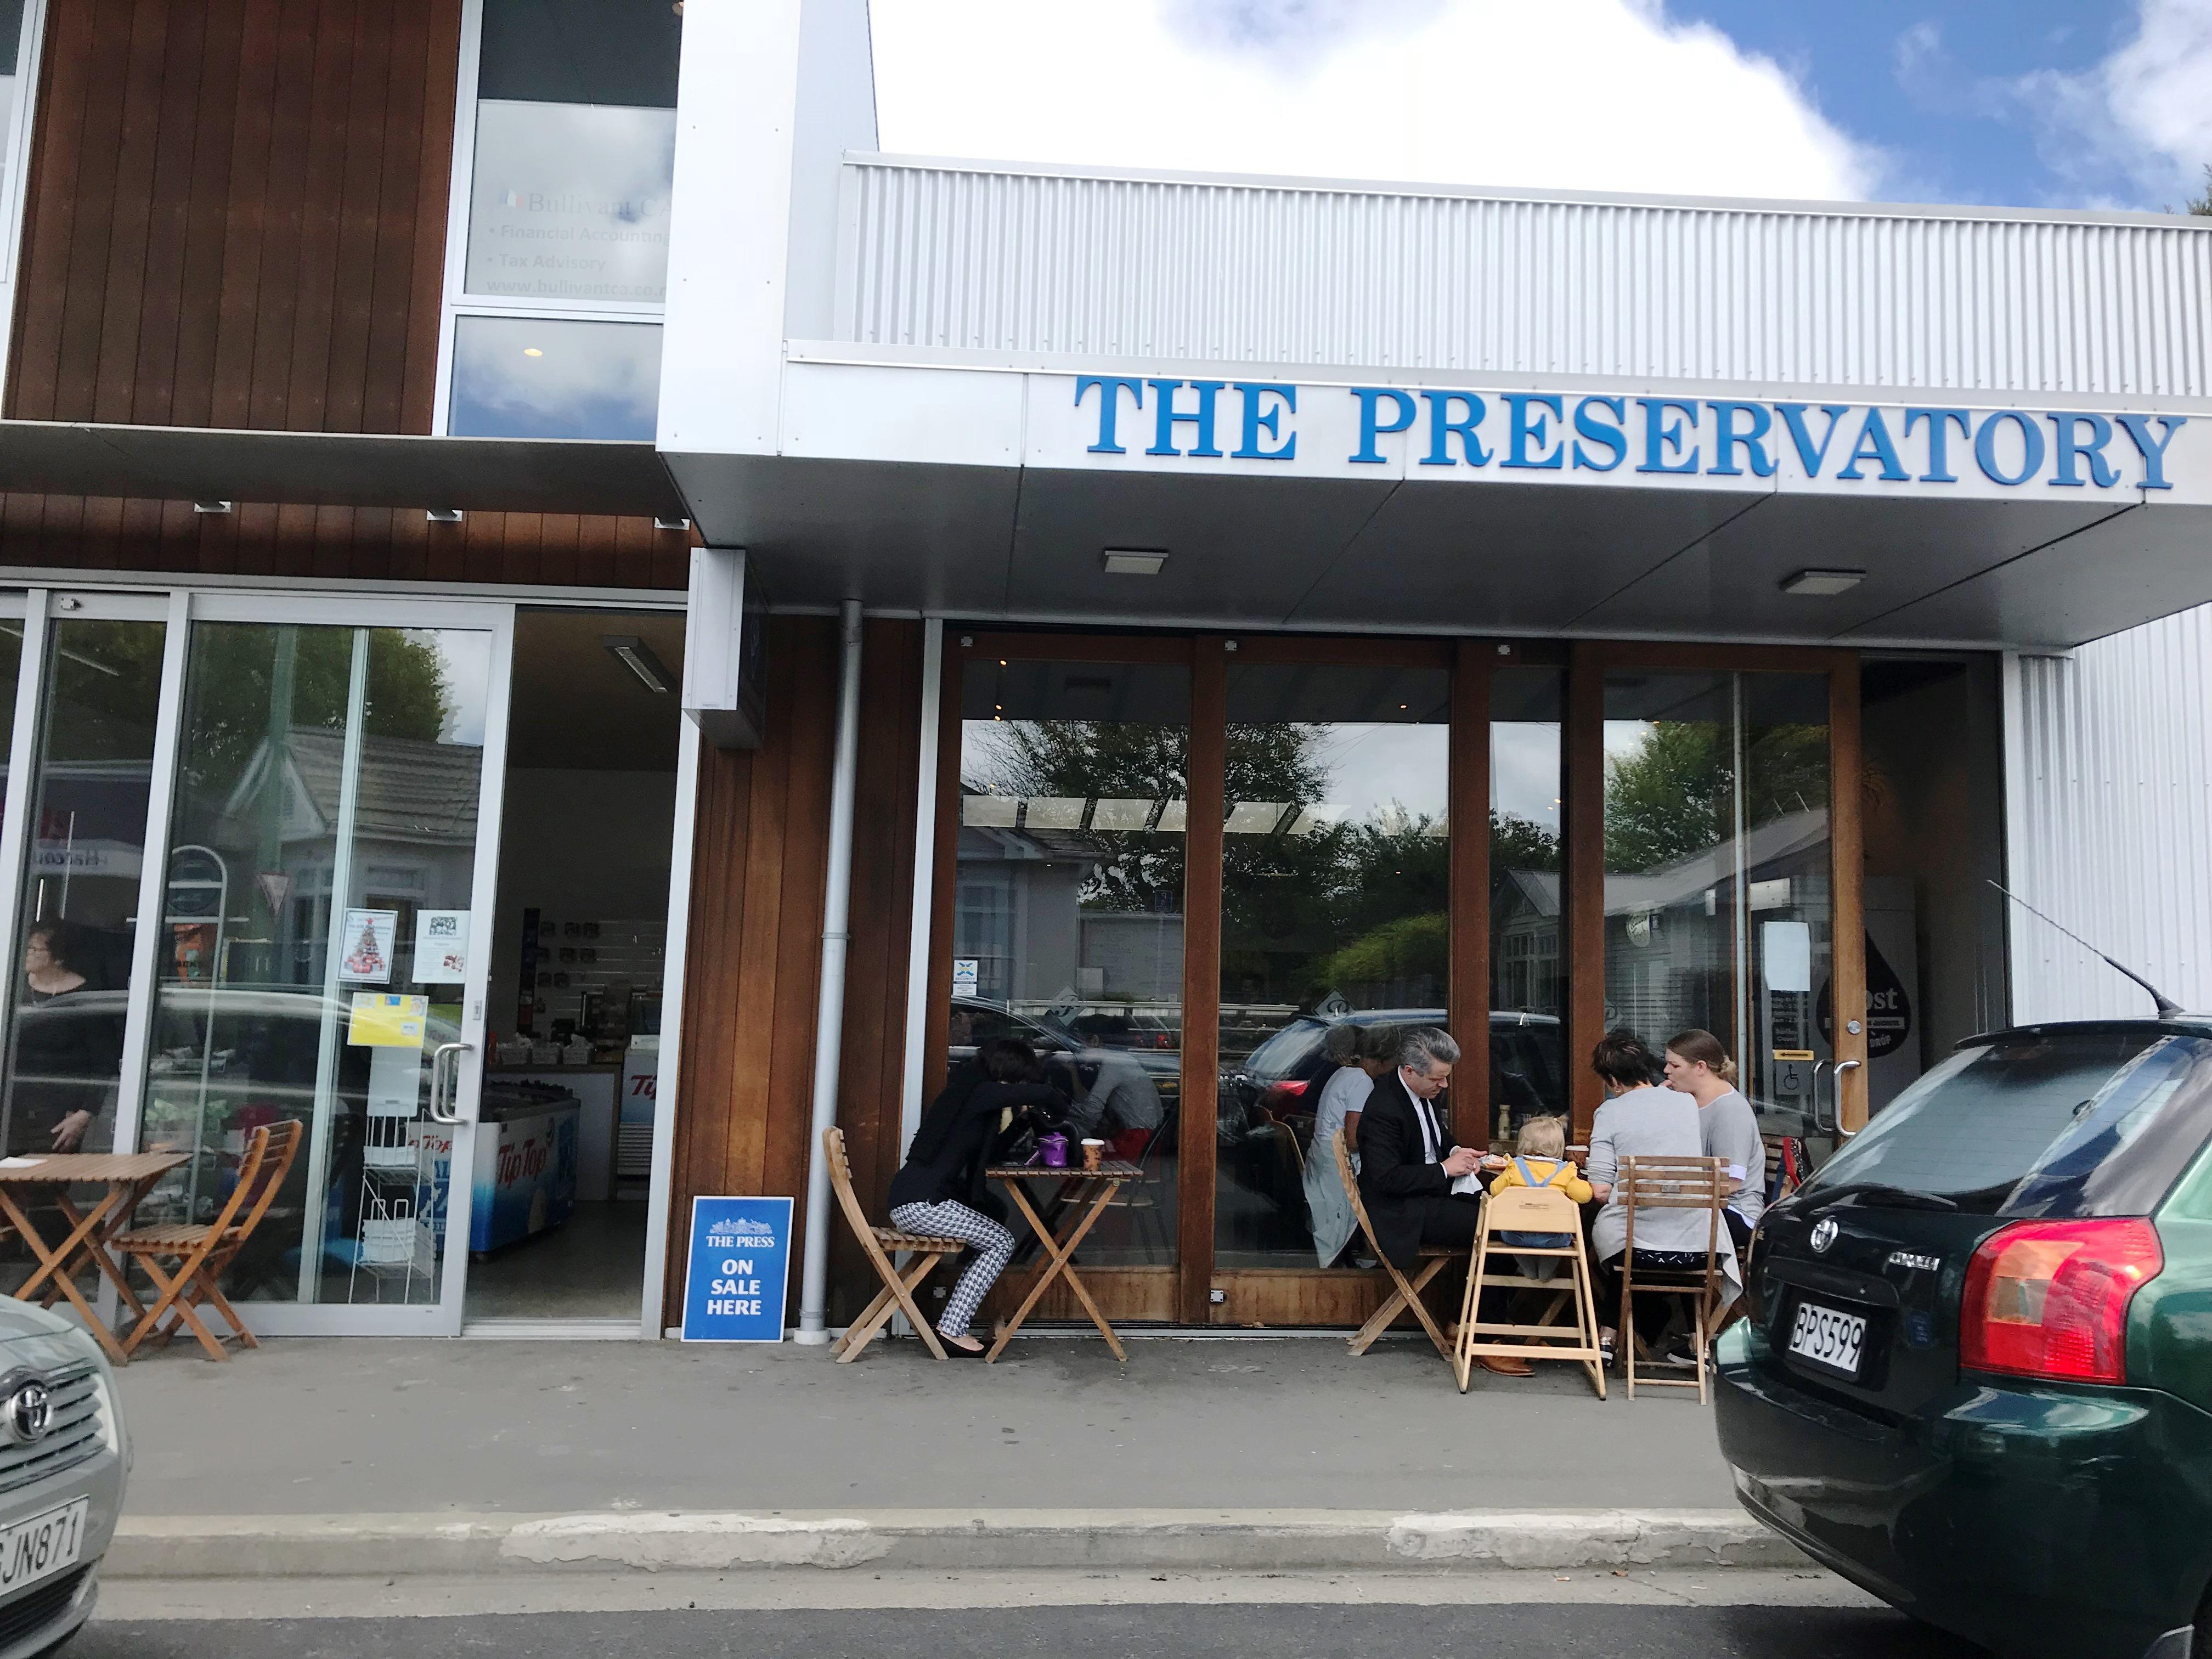 "NZ_ThePreservatory_001"""""